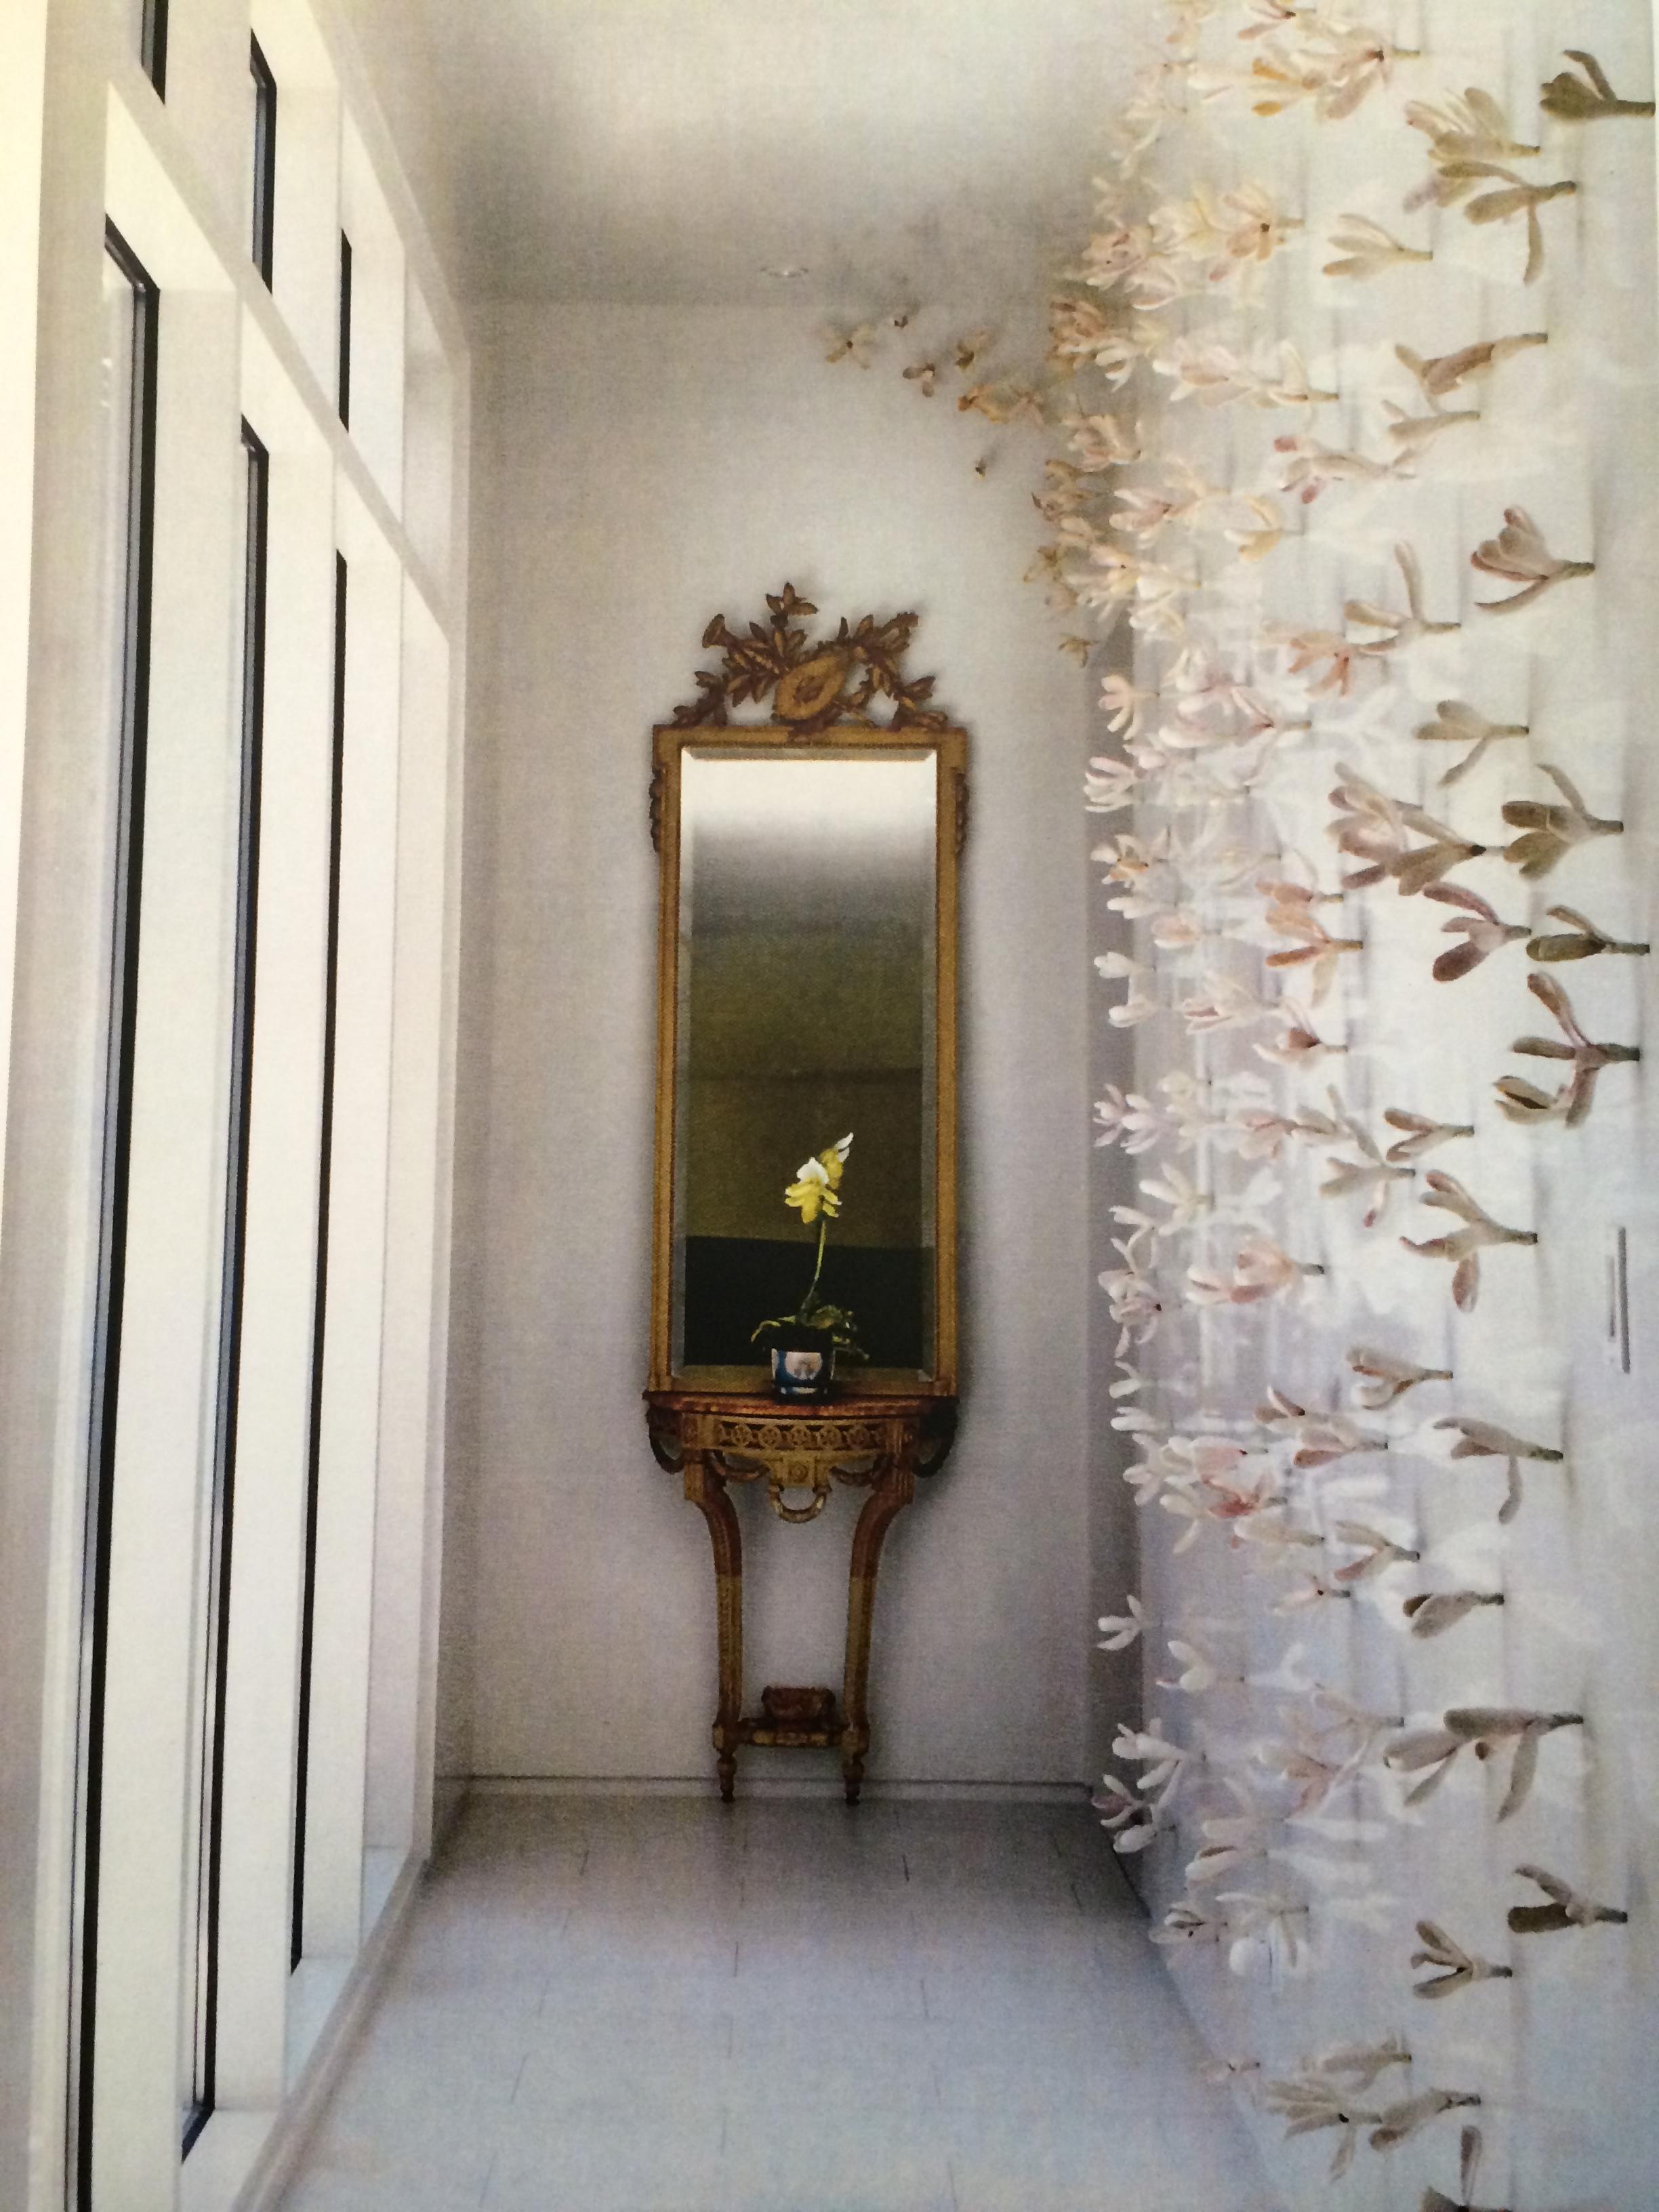 Japanese Magnolia wall installation. Bradley Sabin. 16 pieces glazed ceramic magnolas with steel screws. Value: $600.00.